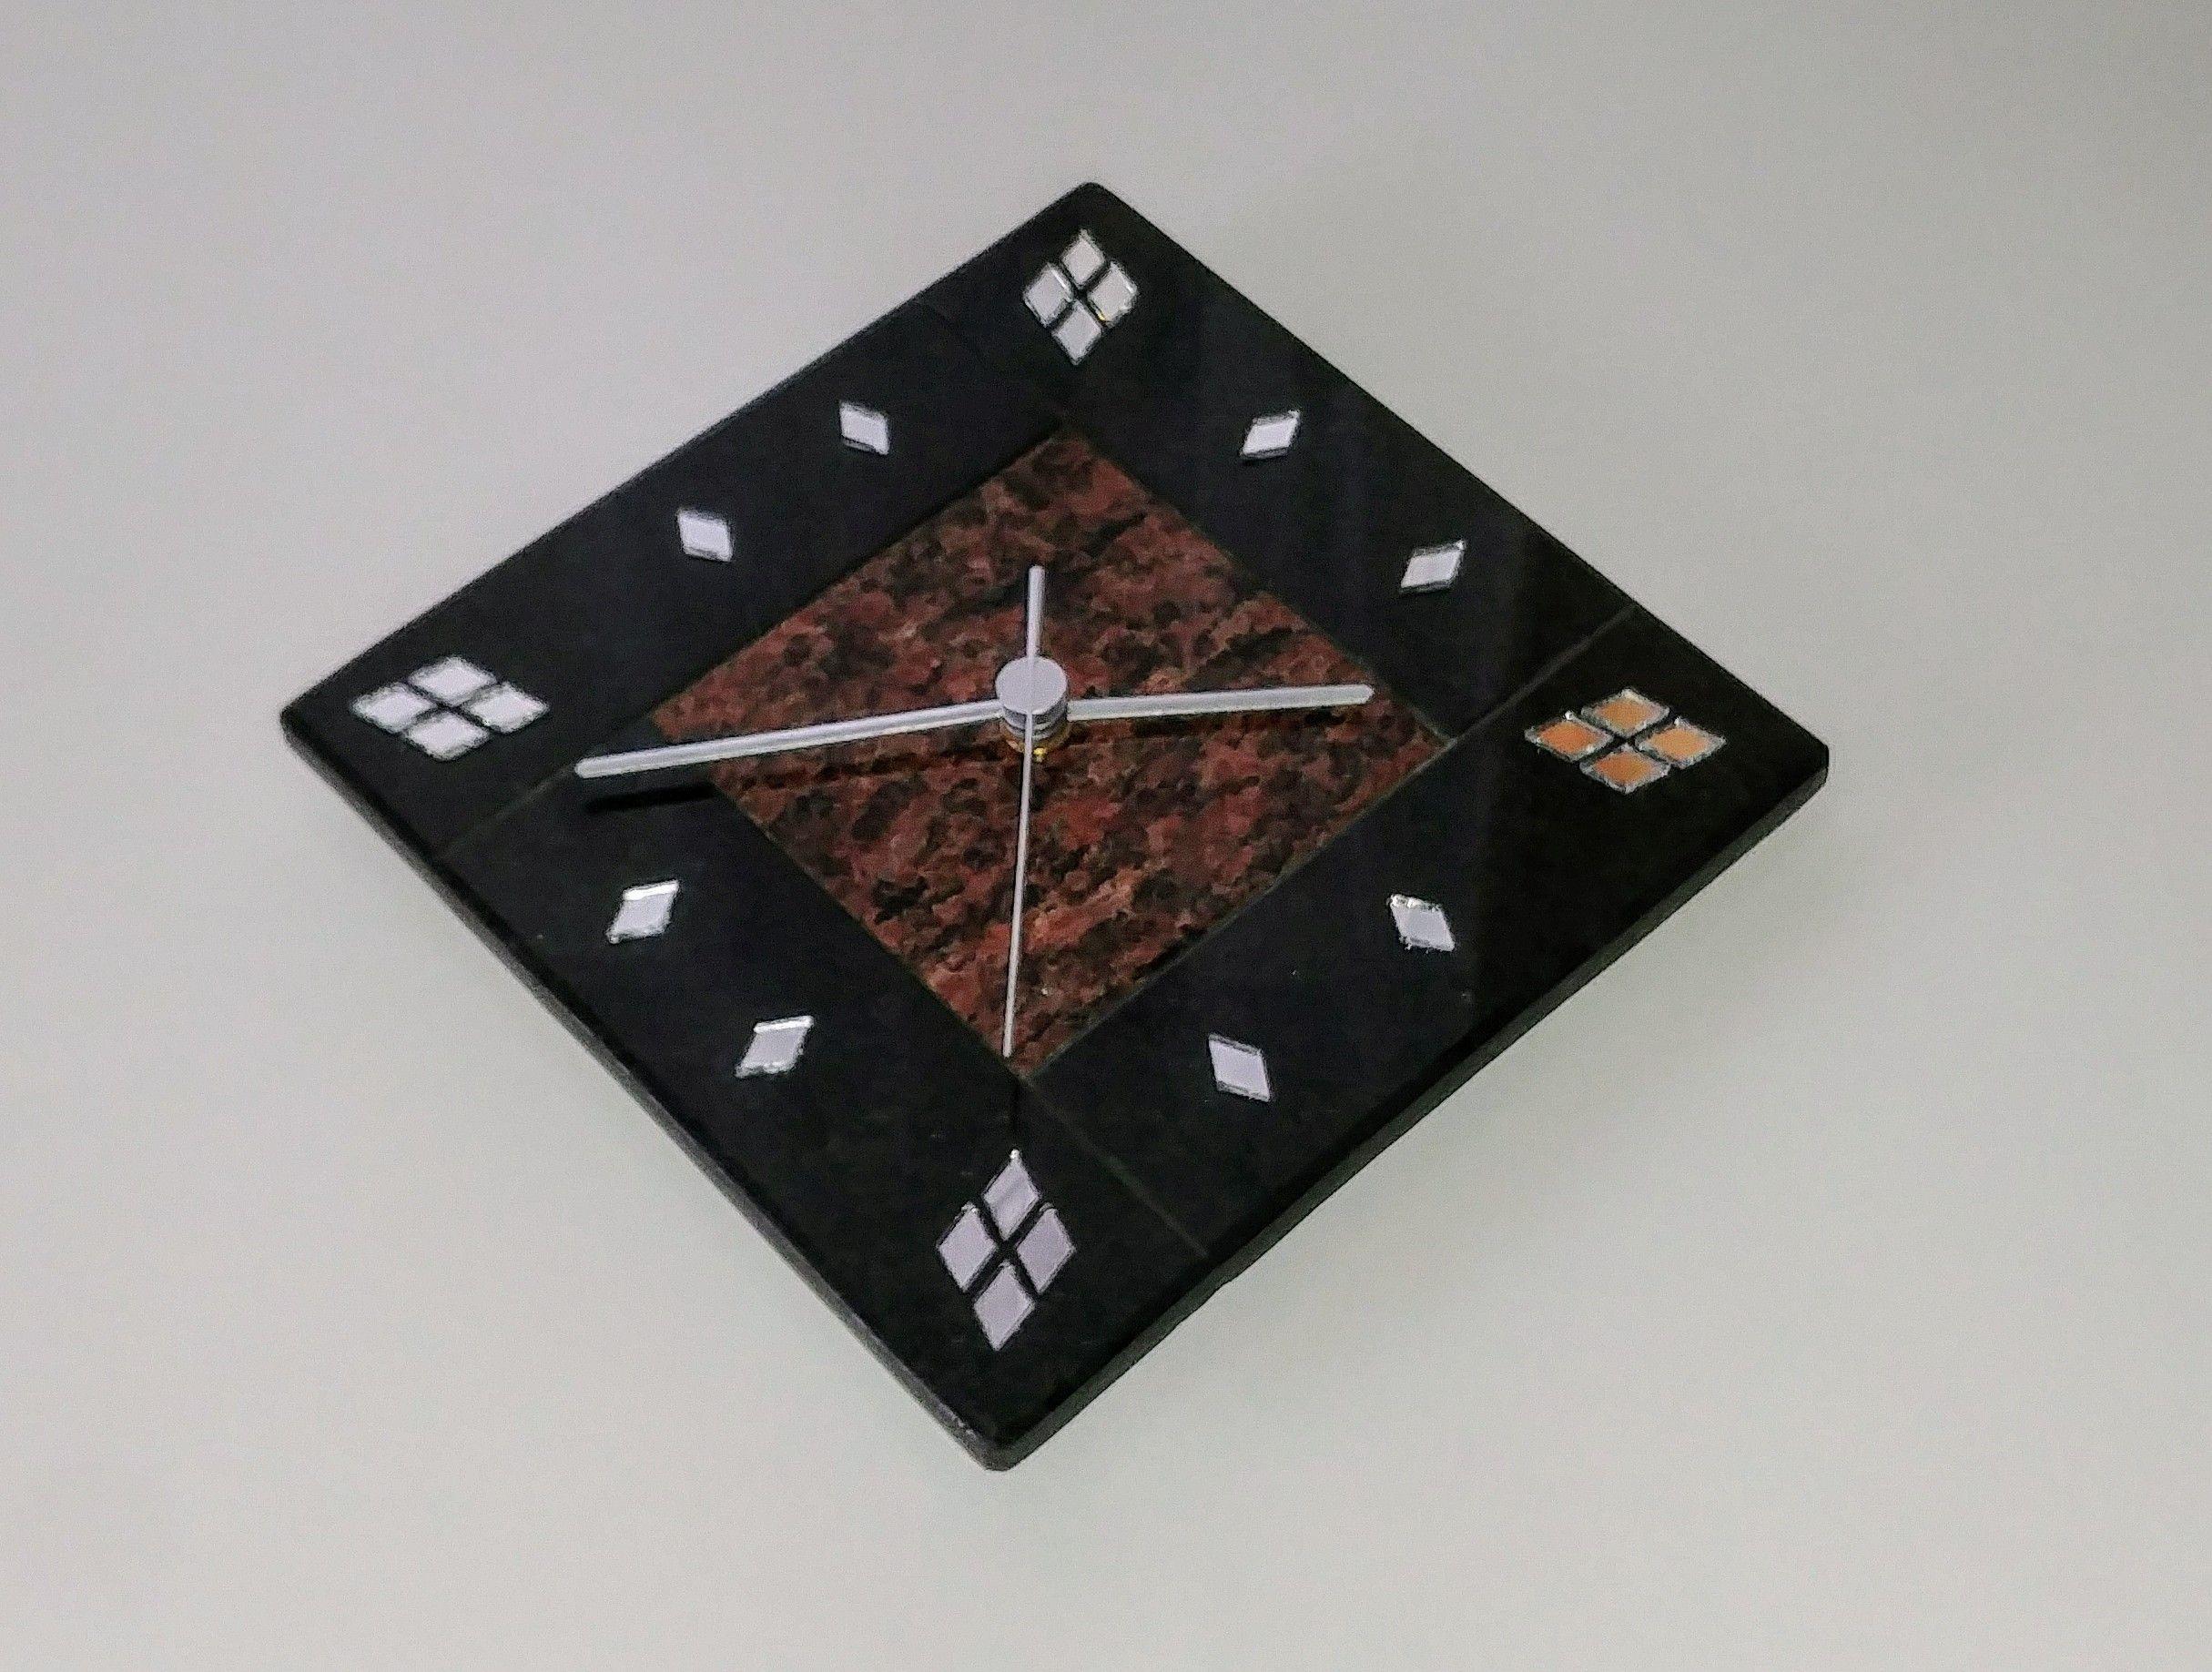 Handmade wall clock made of granite.